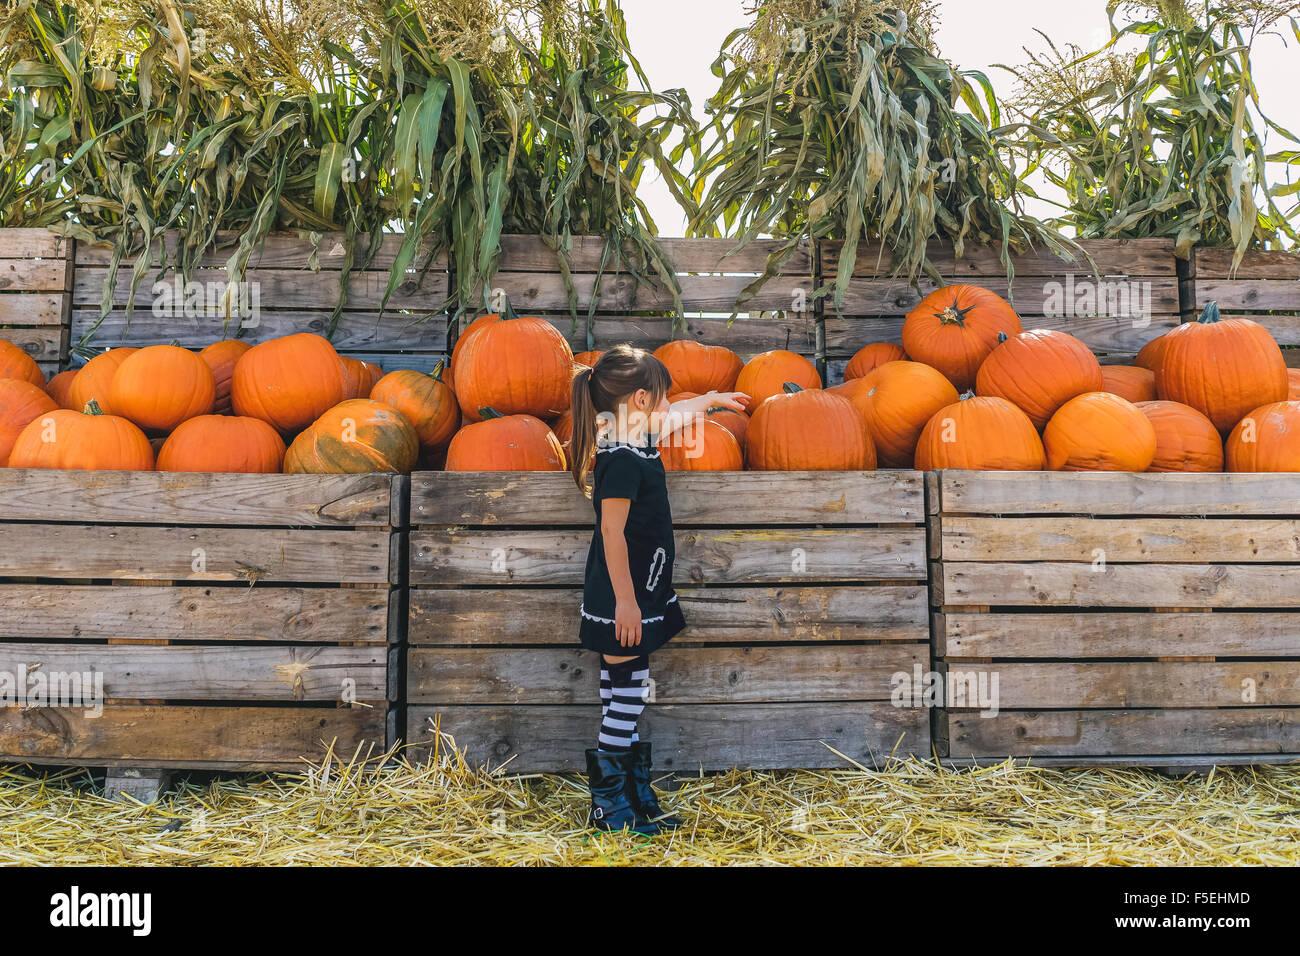 Girl picking out pumpkins at pumpkin farm - Stock Image